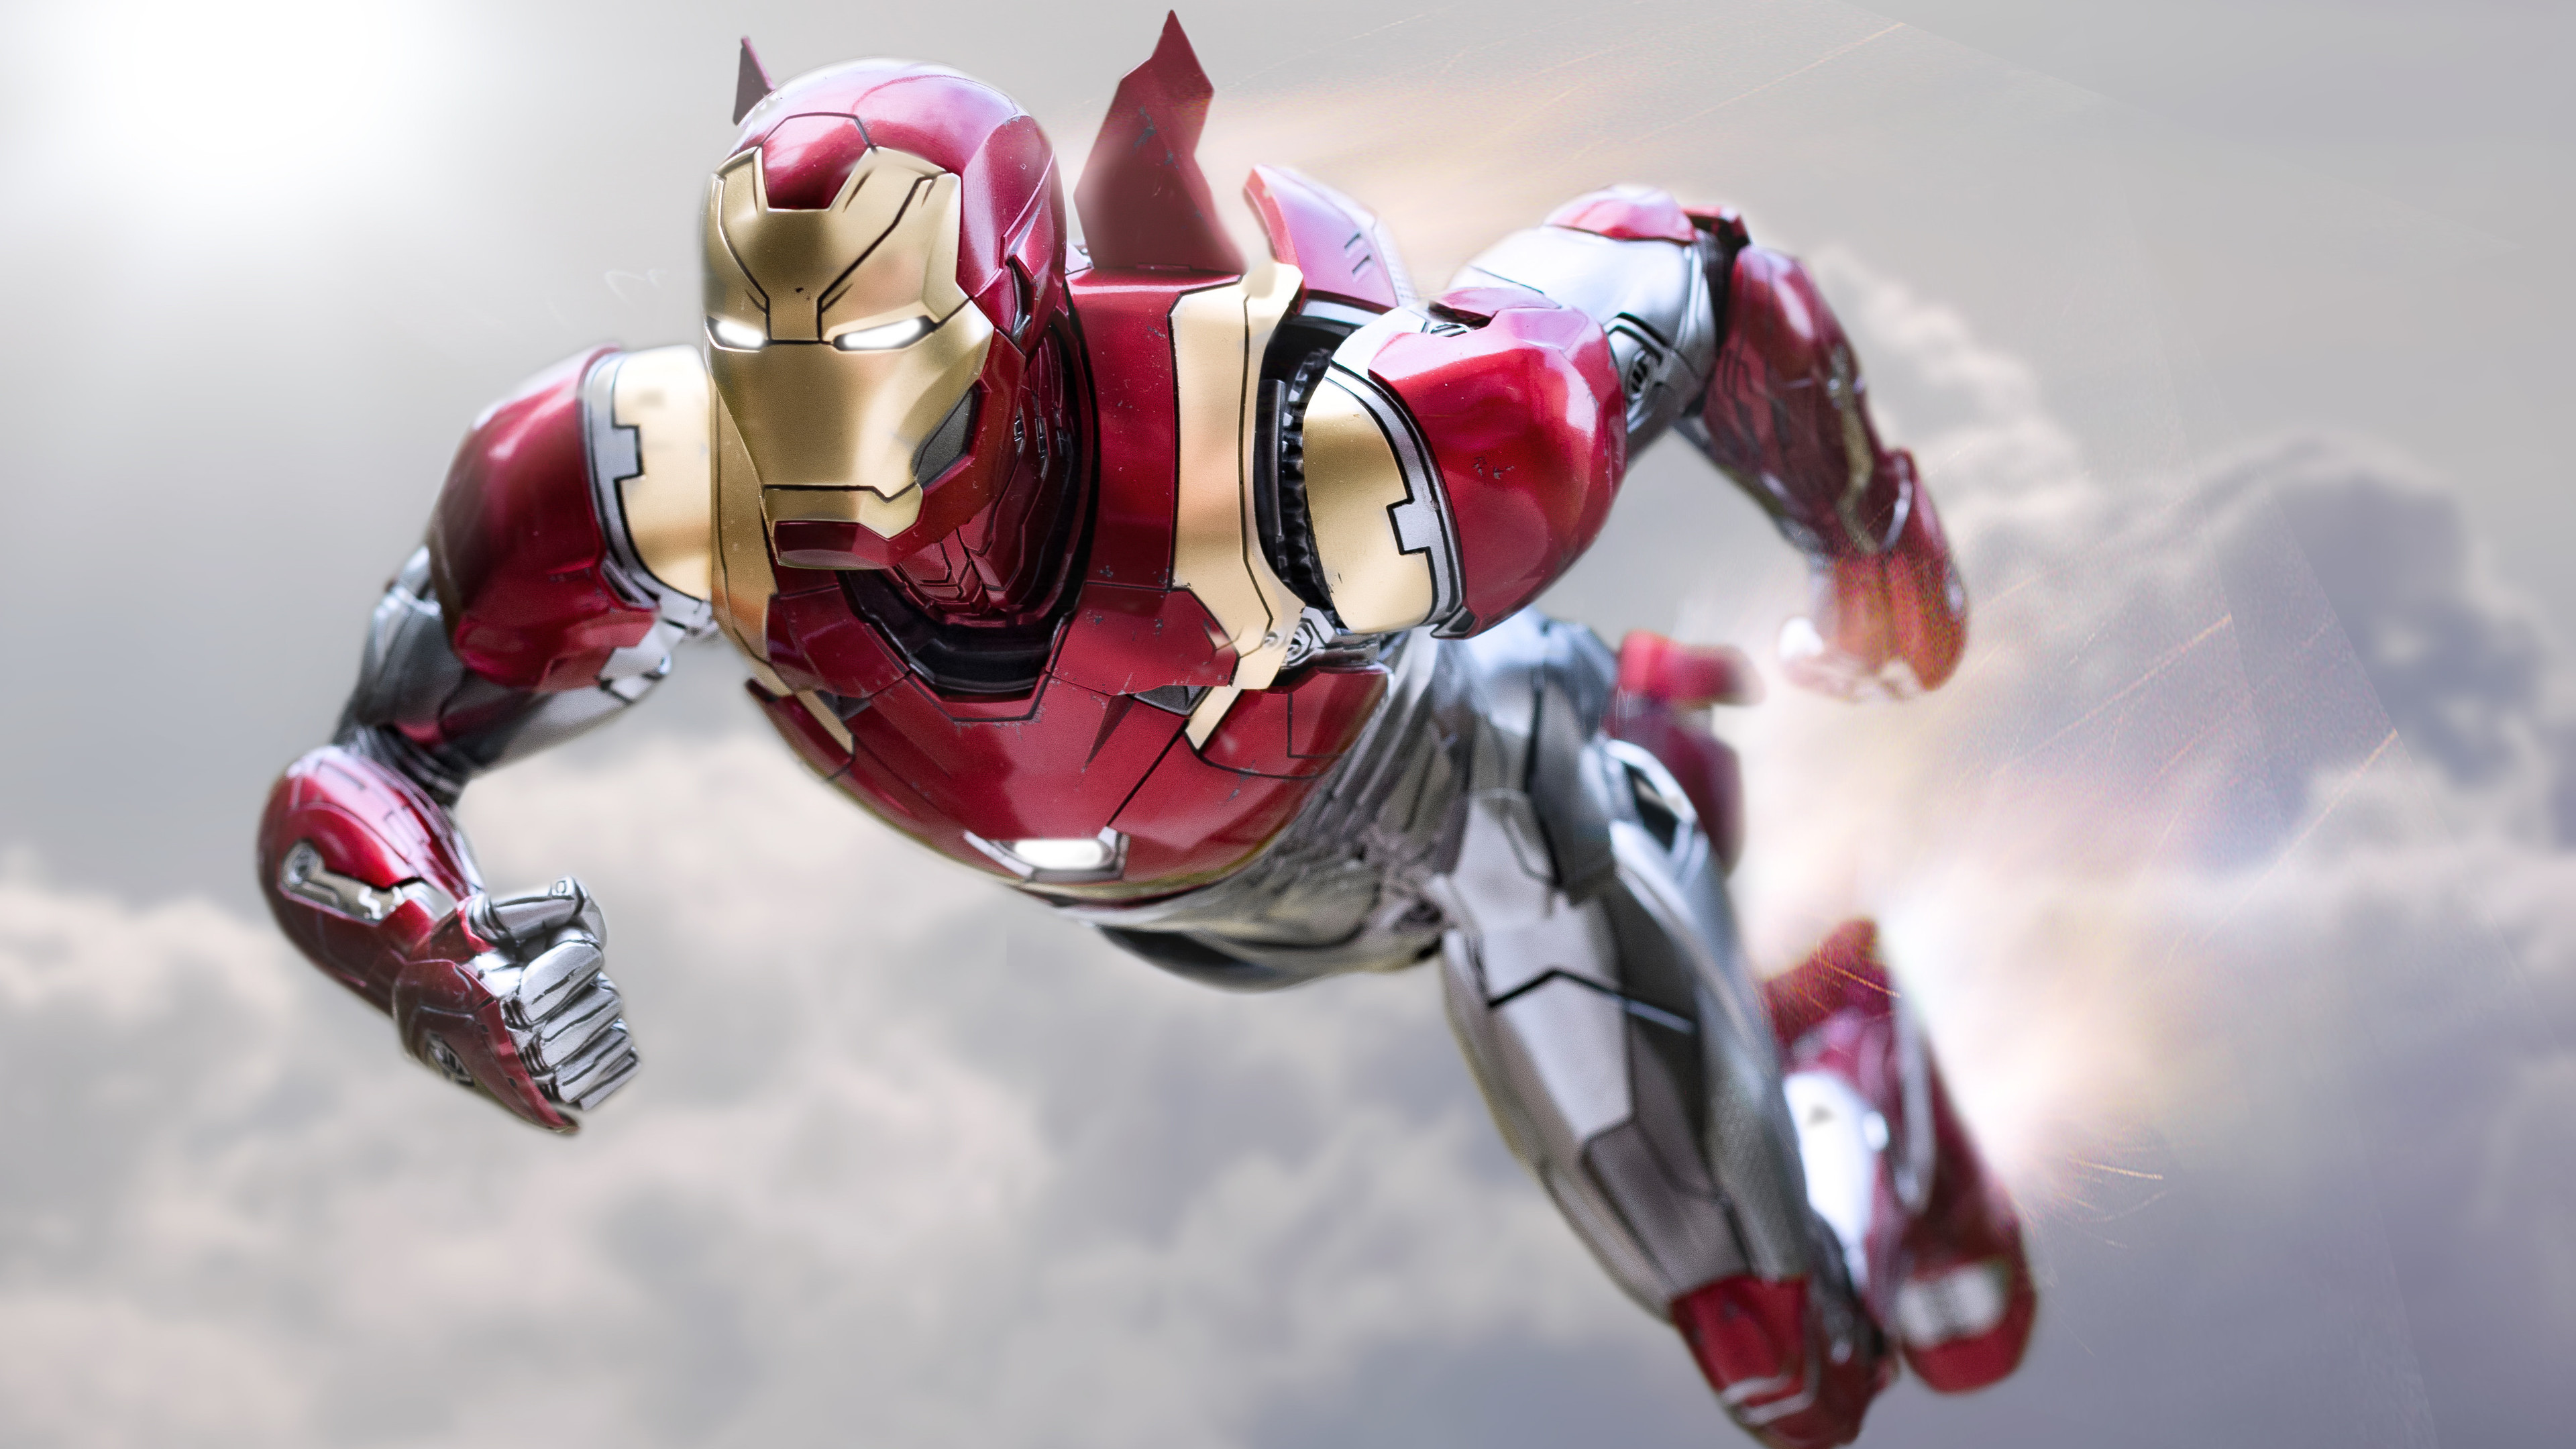 Wallpaper 4k Iron Man 4k New 4k Wallpapers Art Wallpapers